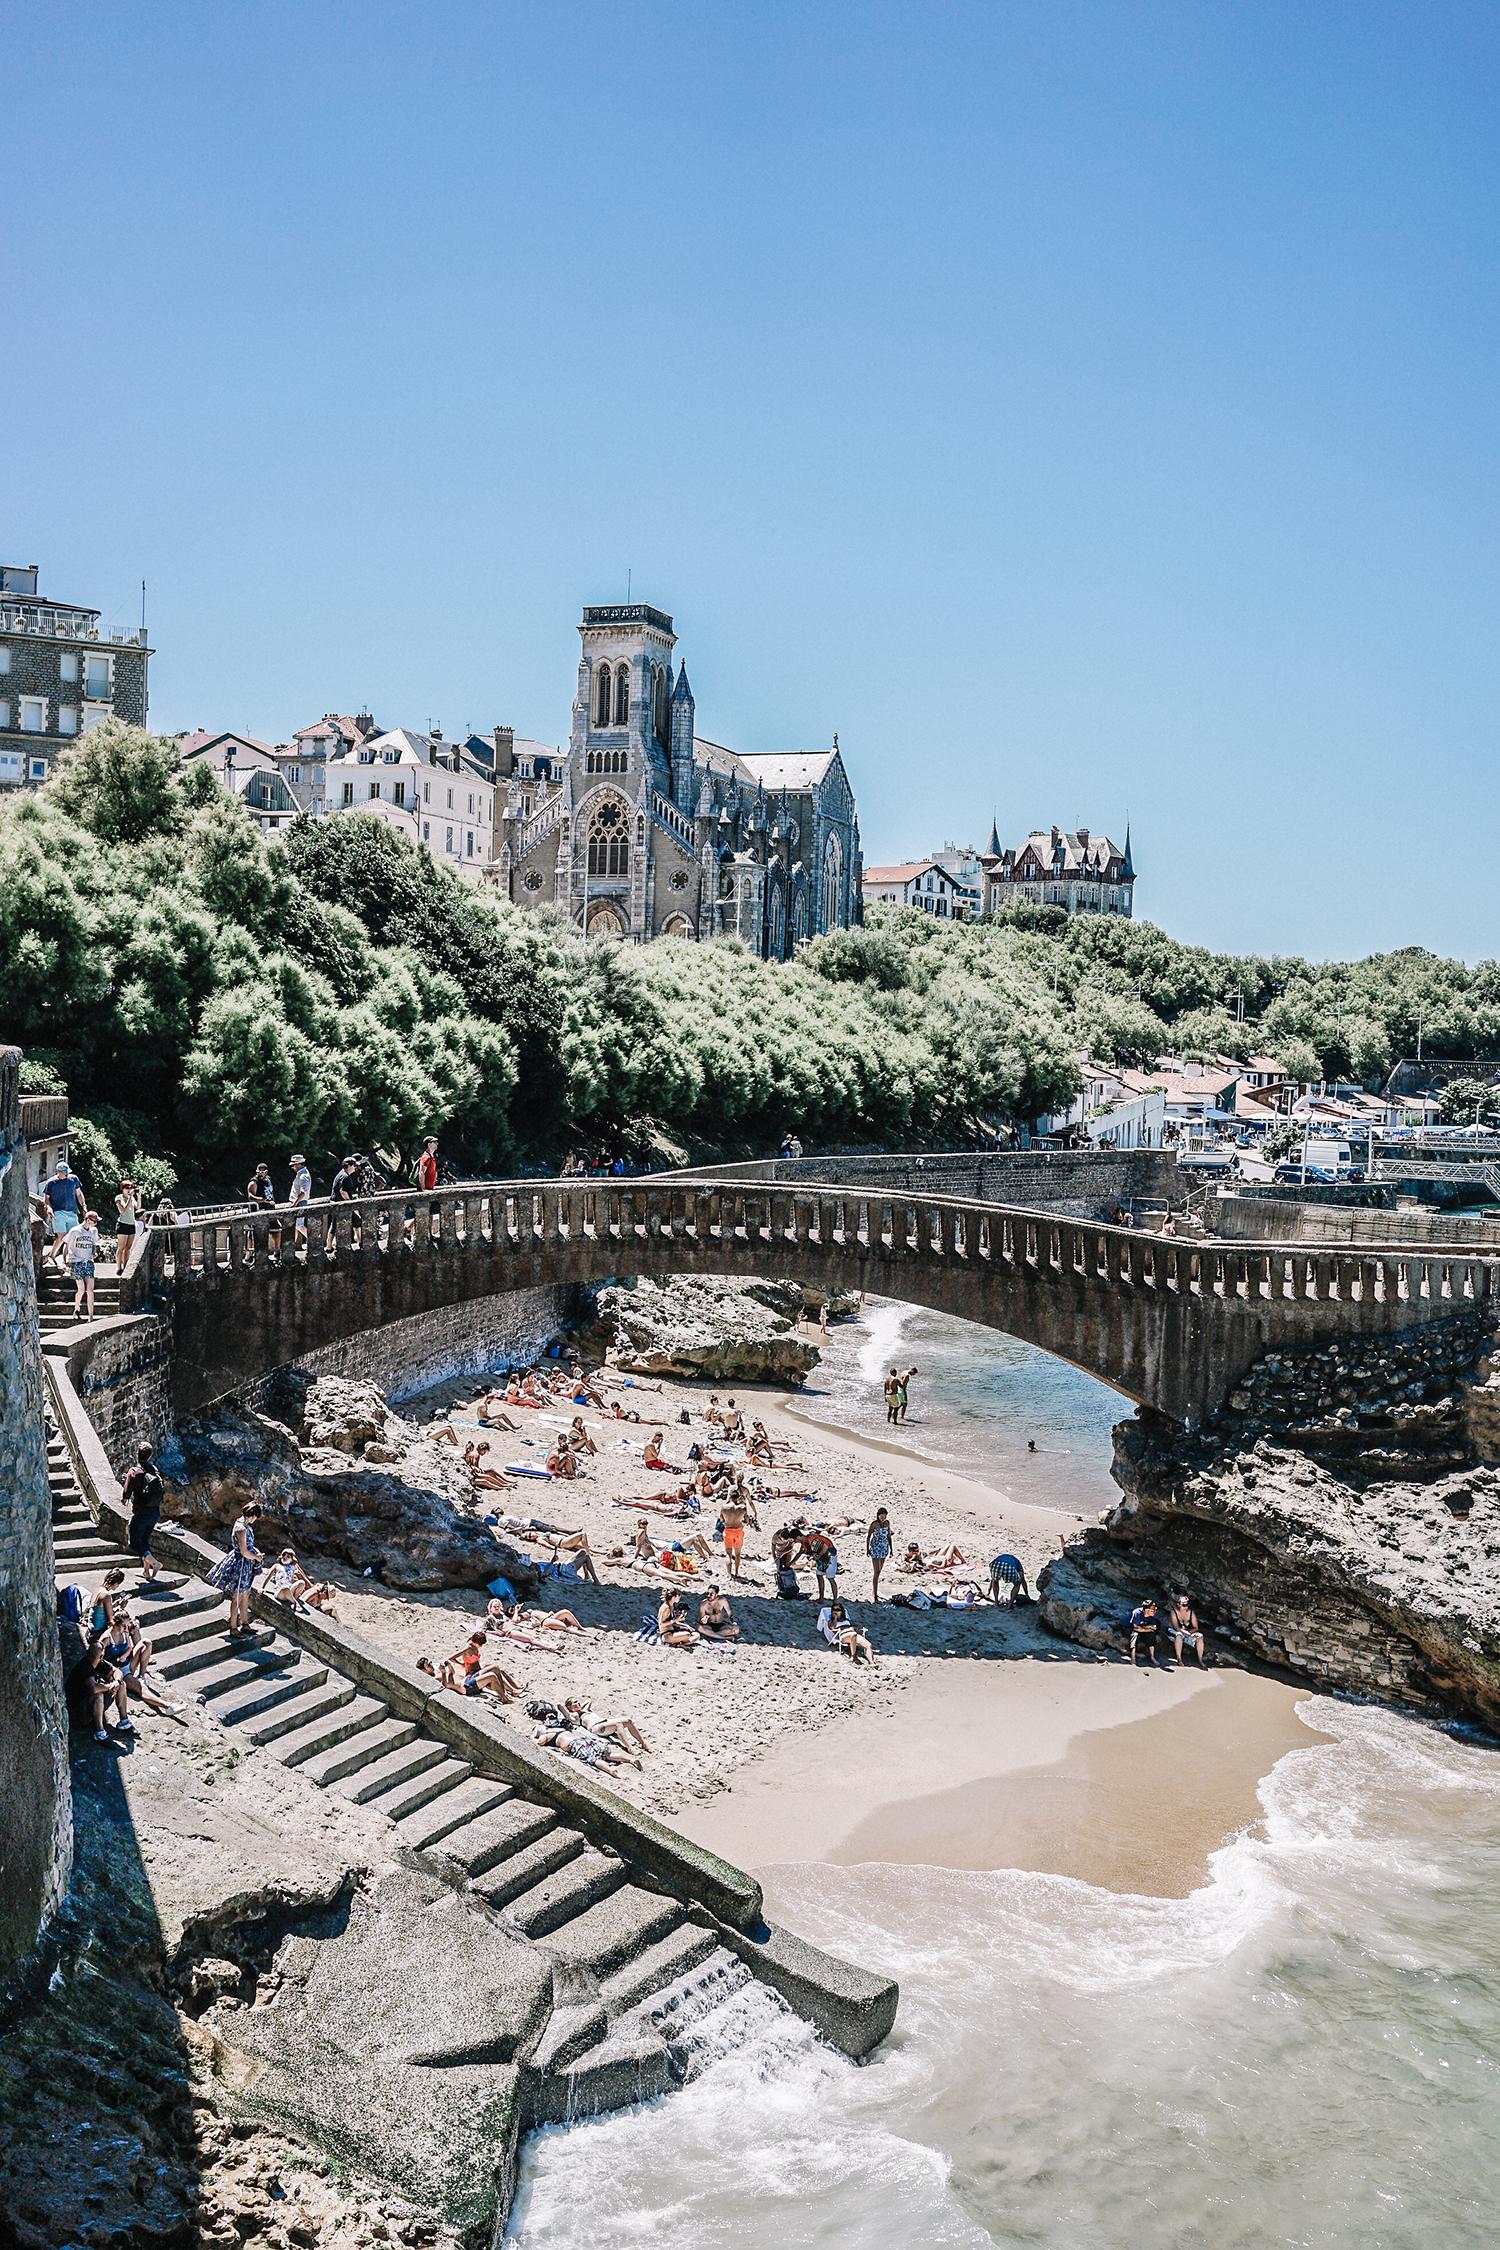 Levis-Live_In_Levis-Biarritz-Big_Festival-Collage_Vintage-76